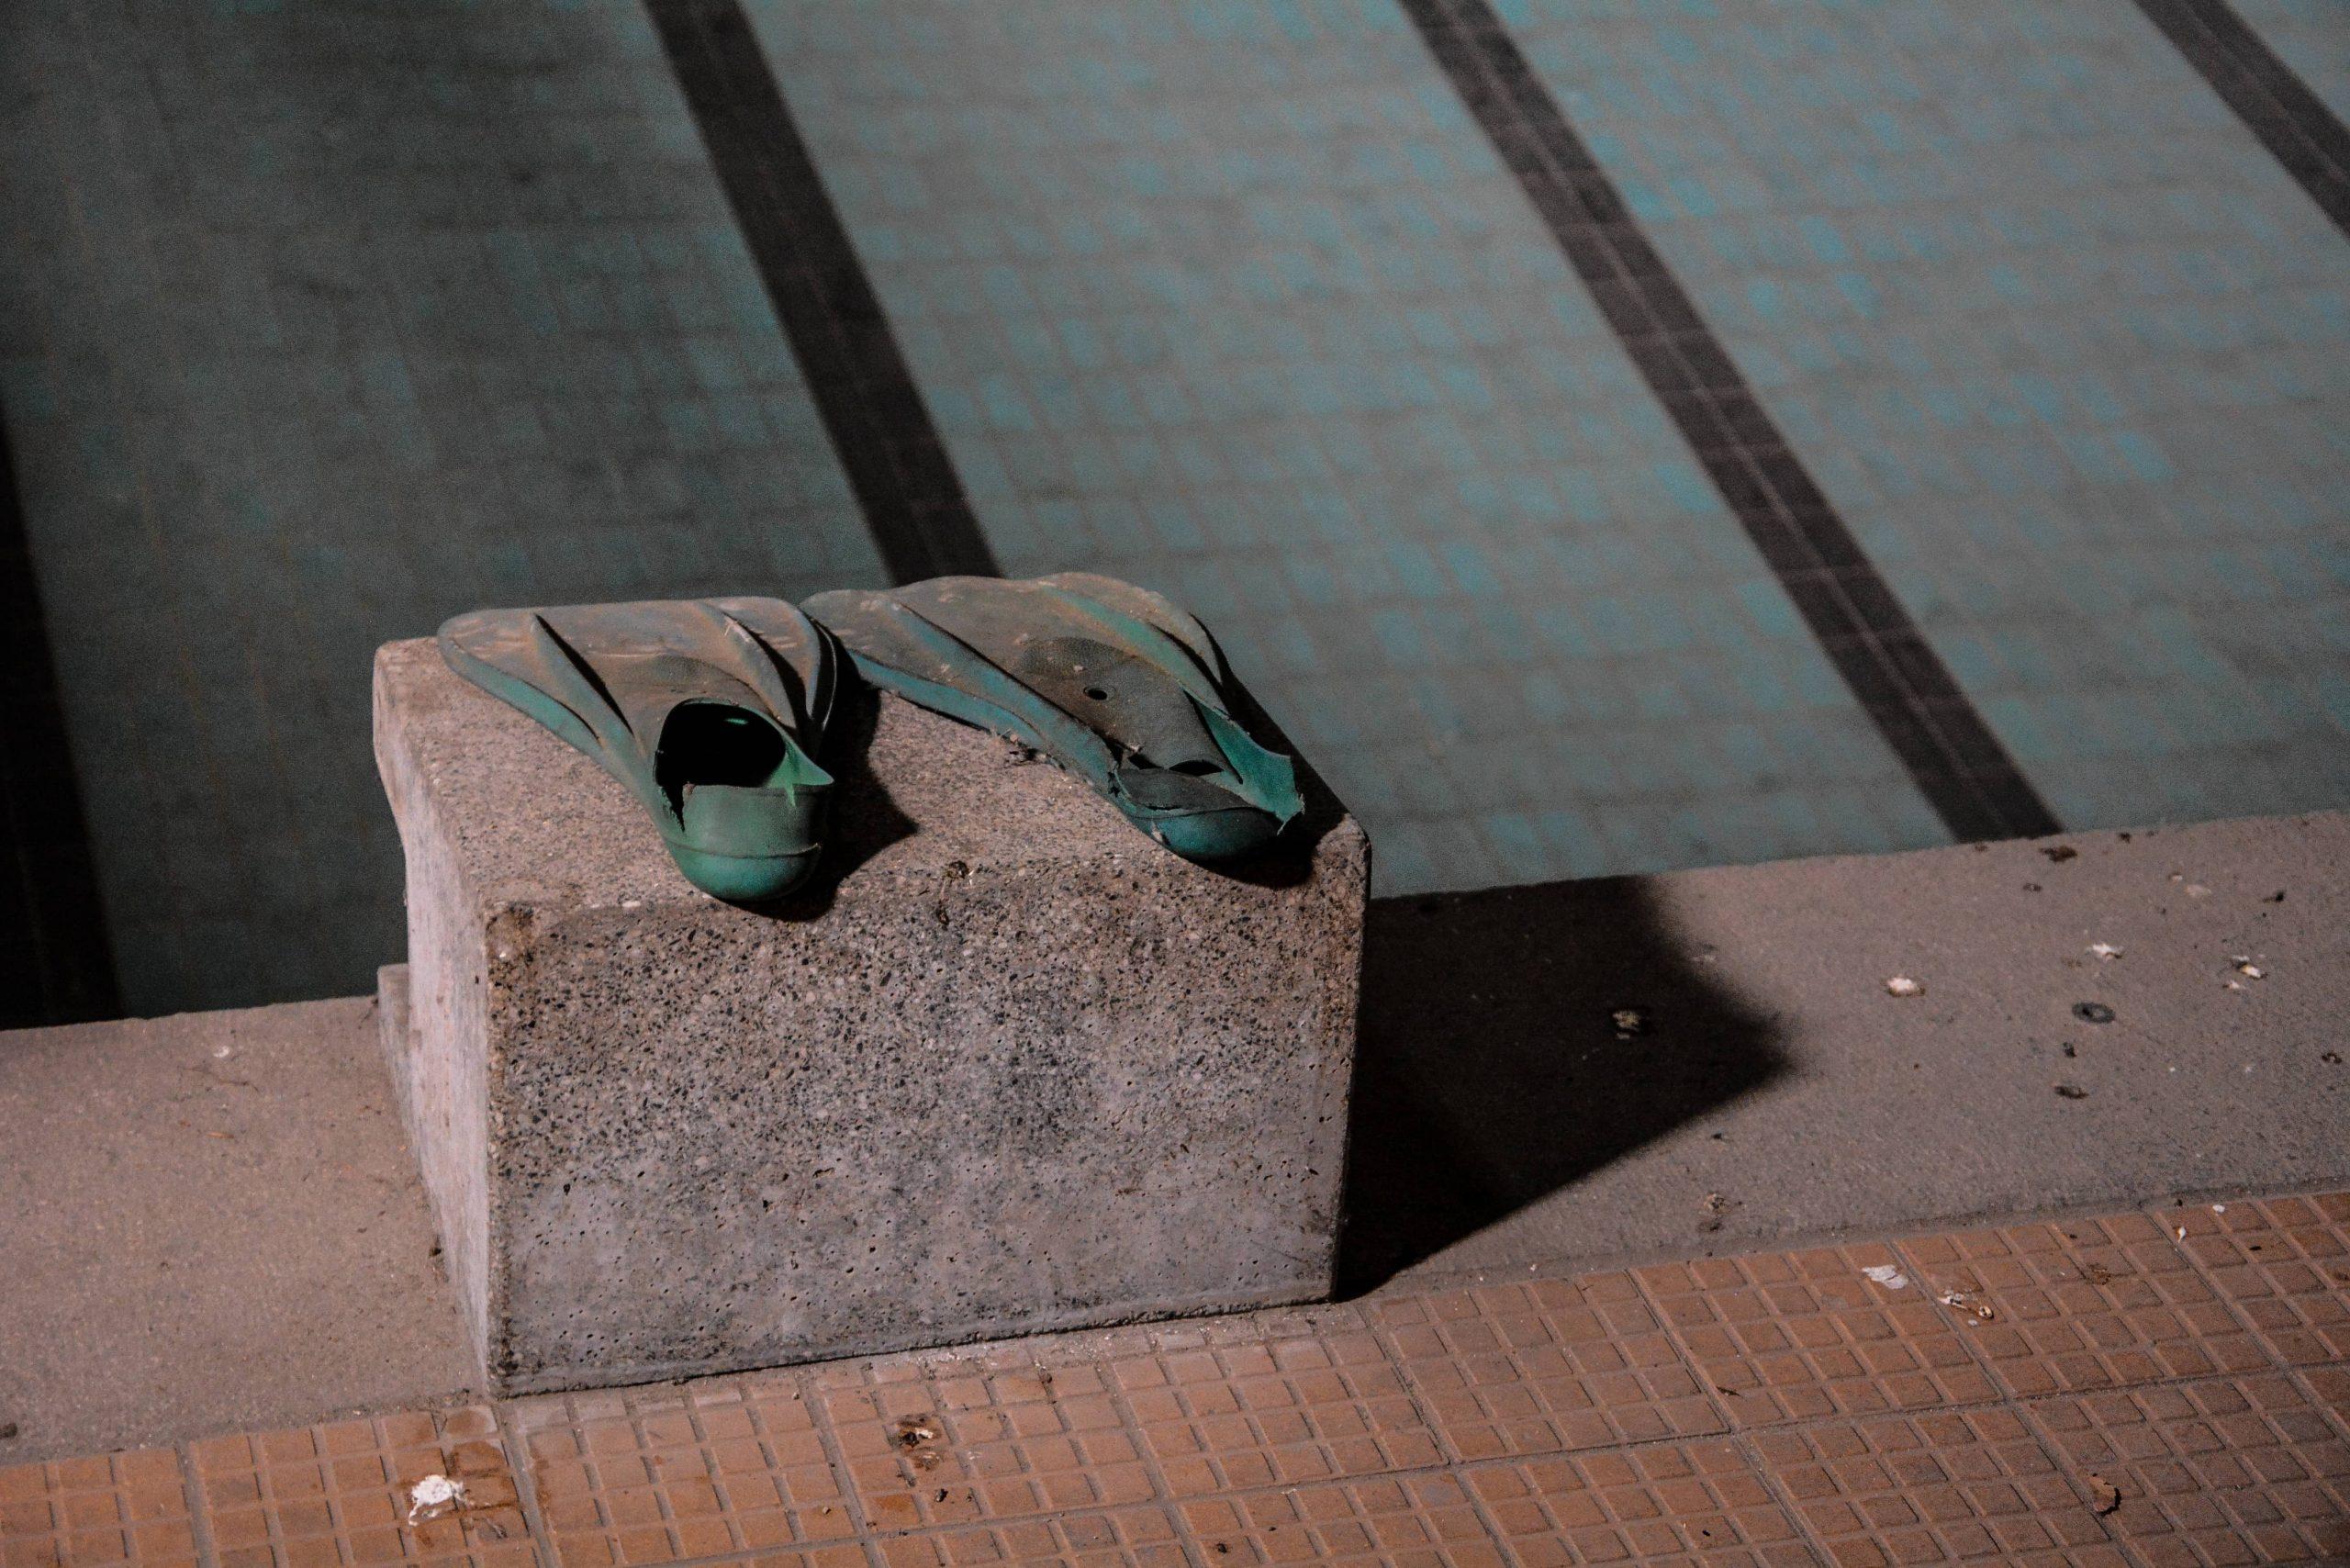 schwimmblock flipper stadtbad lichtenberg hubertusbad berlin abandoned pool urbex lost places